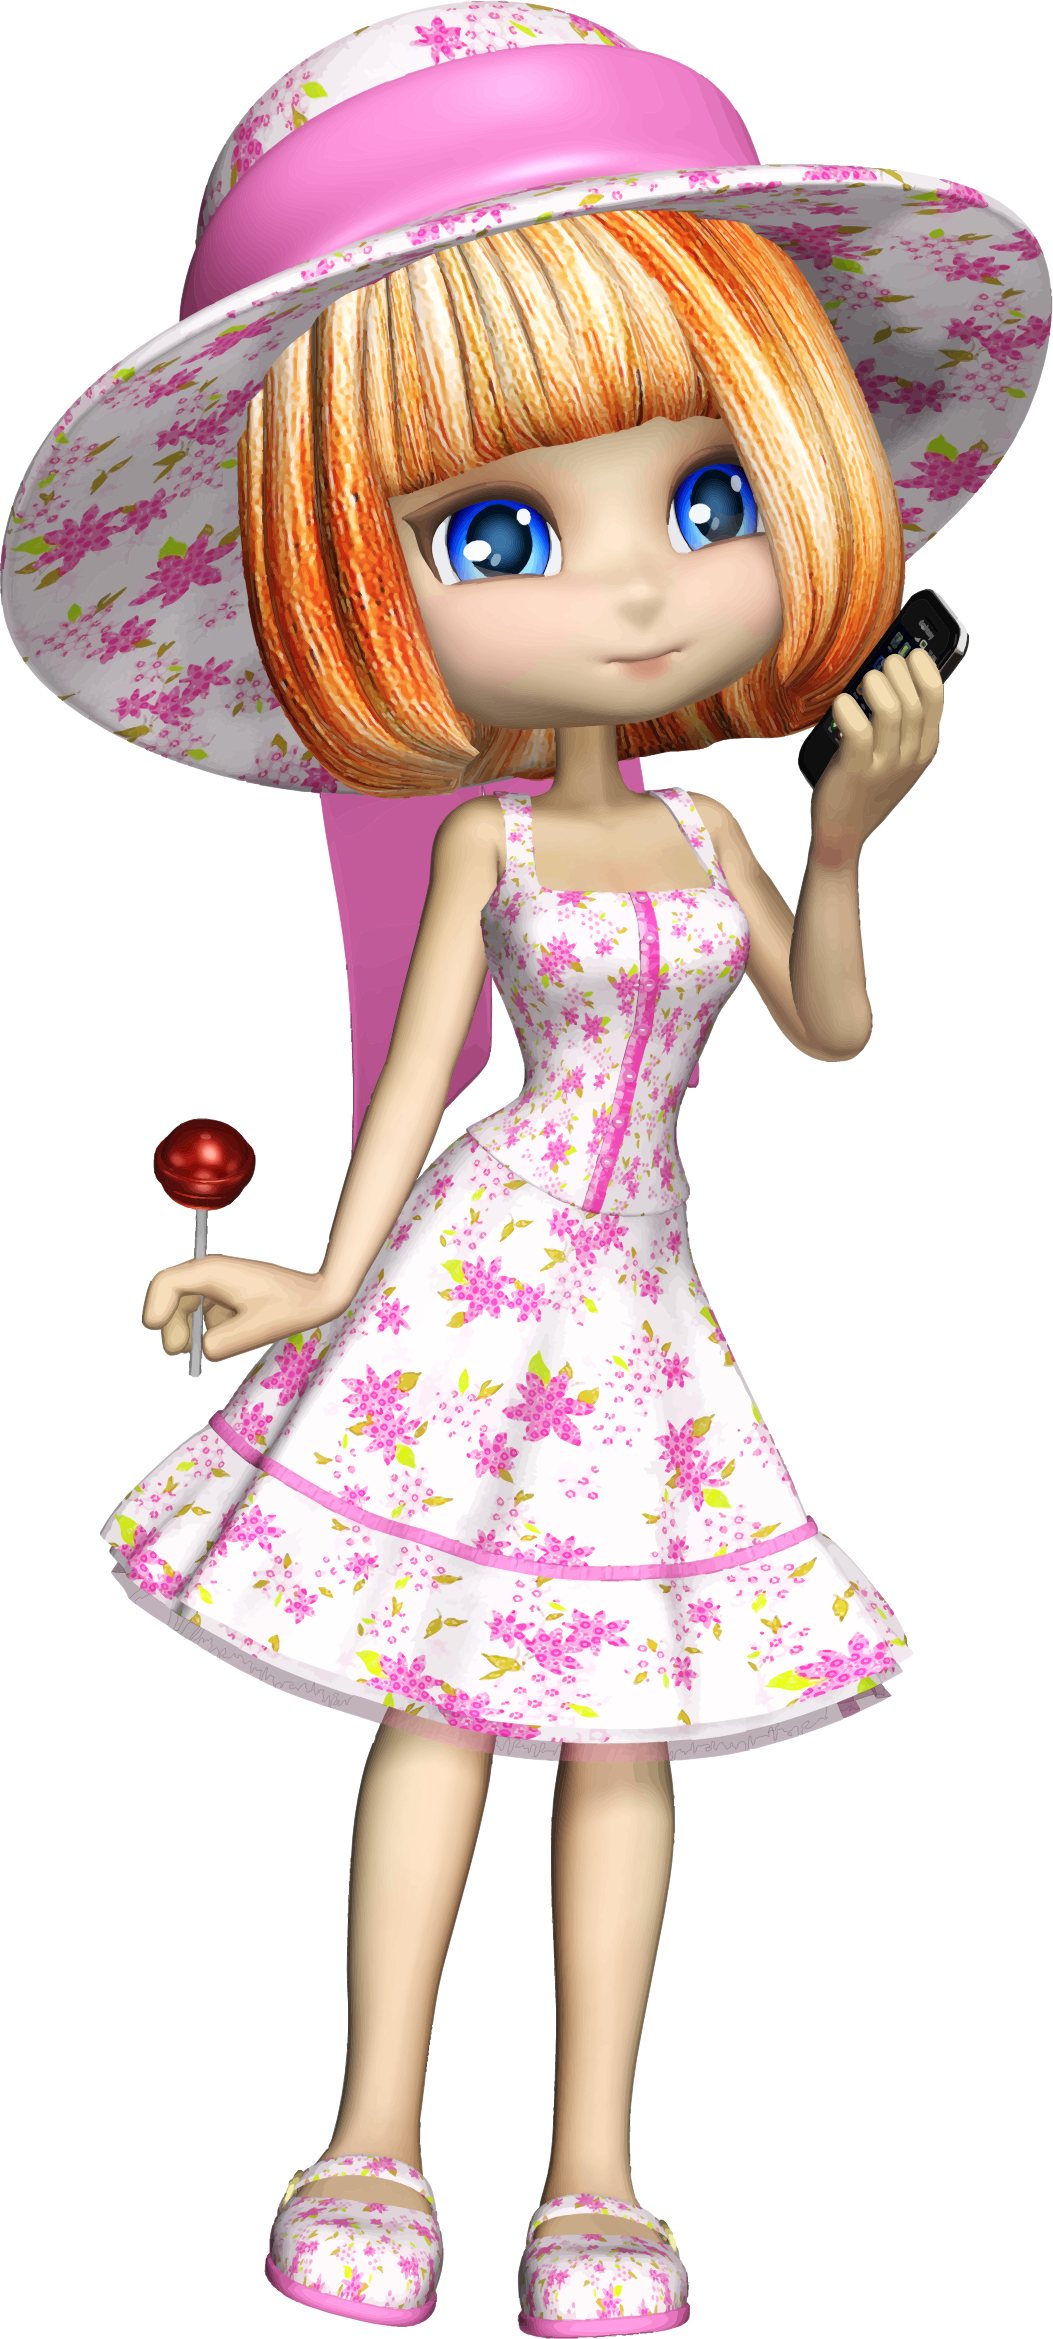 Cartoon girl big image. Cool clipart fashionable